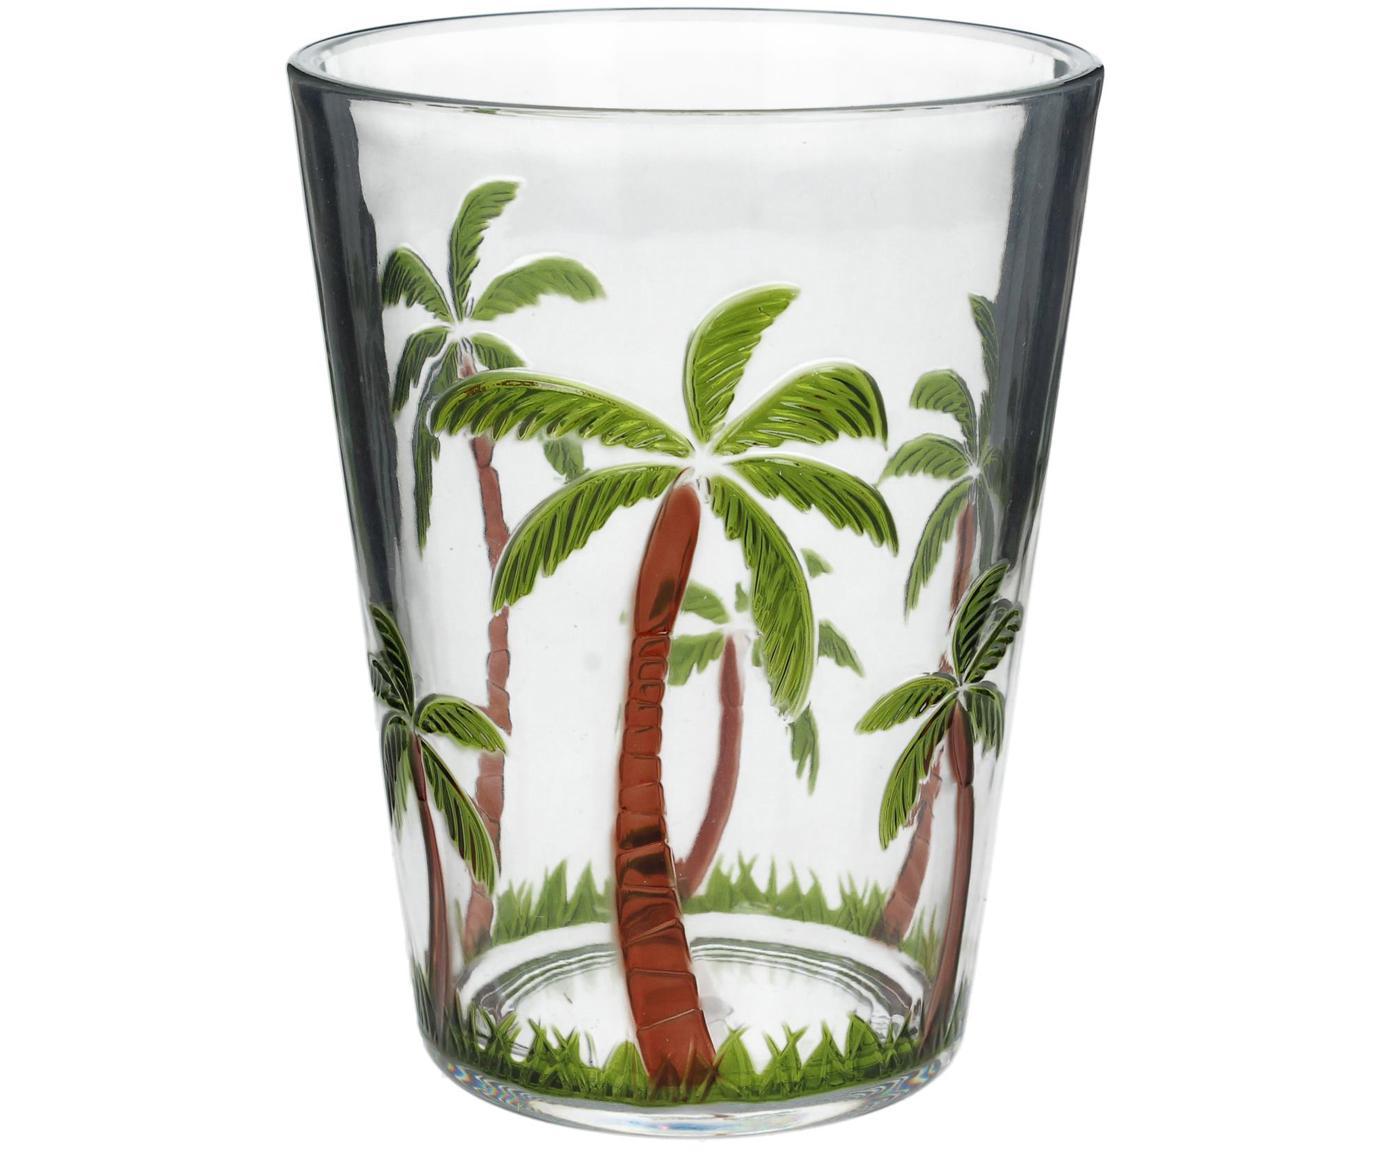 Acryl-Wasserglas Gabrielle, Acryl, Transparent, Grün, Braun, Ø 9 x H 12 cm